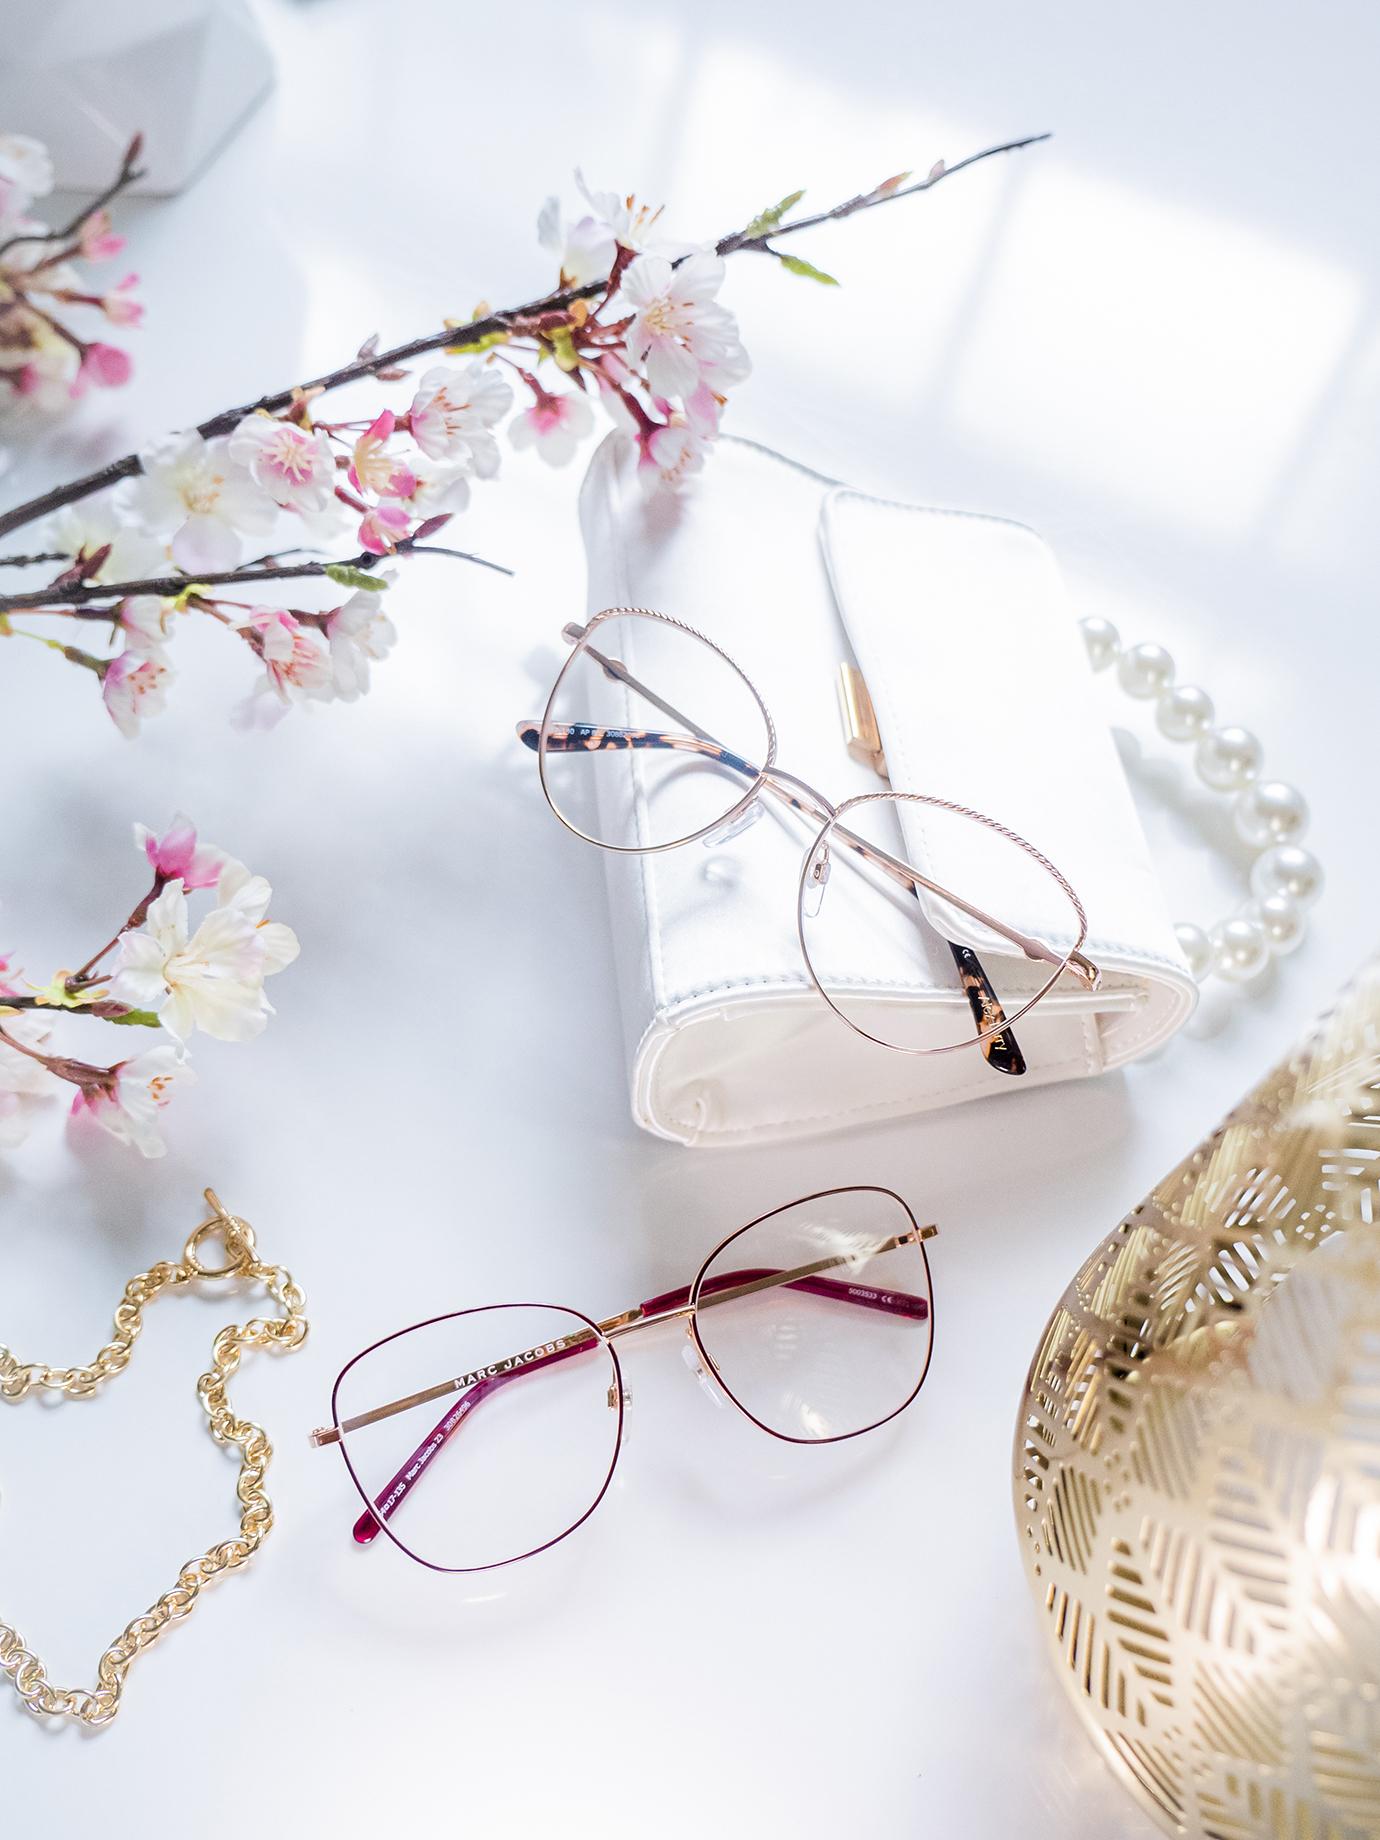 Specsavers MAR21 - 31